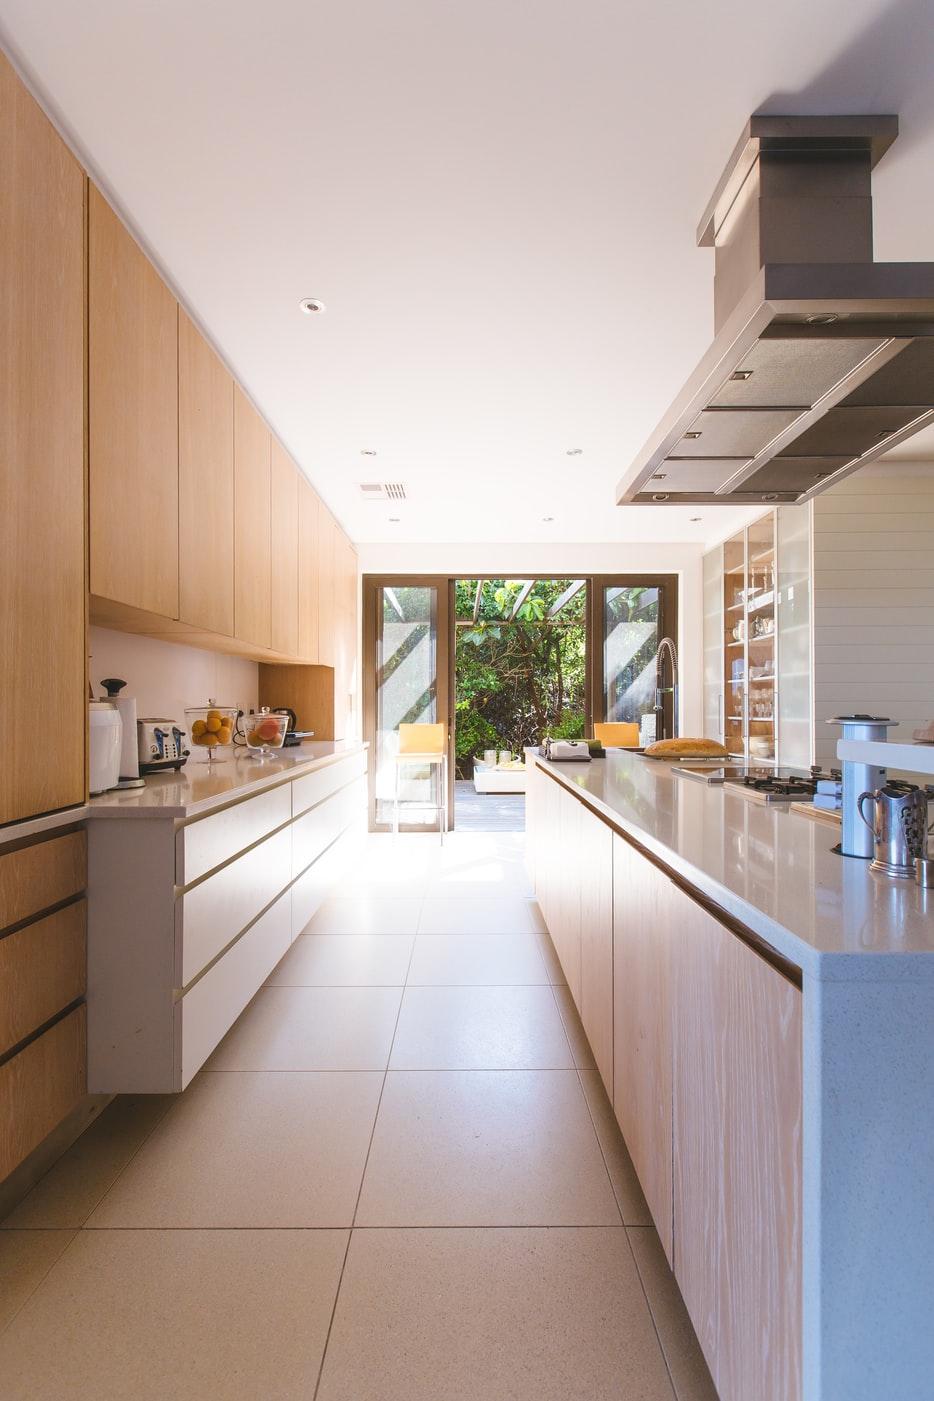 TAU BUILDERS: Renovation Contractors